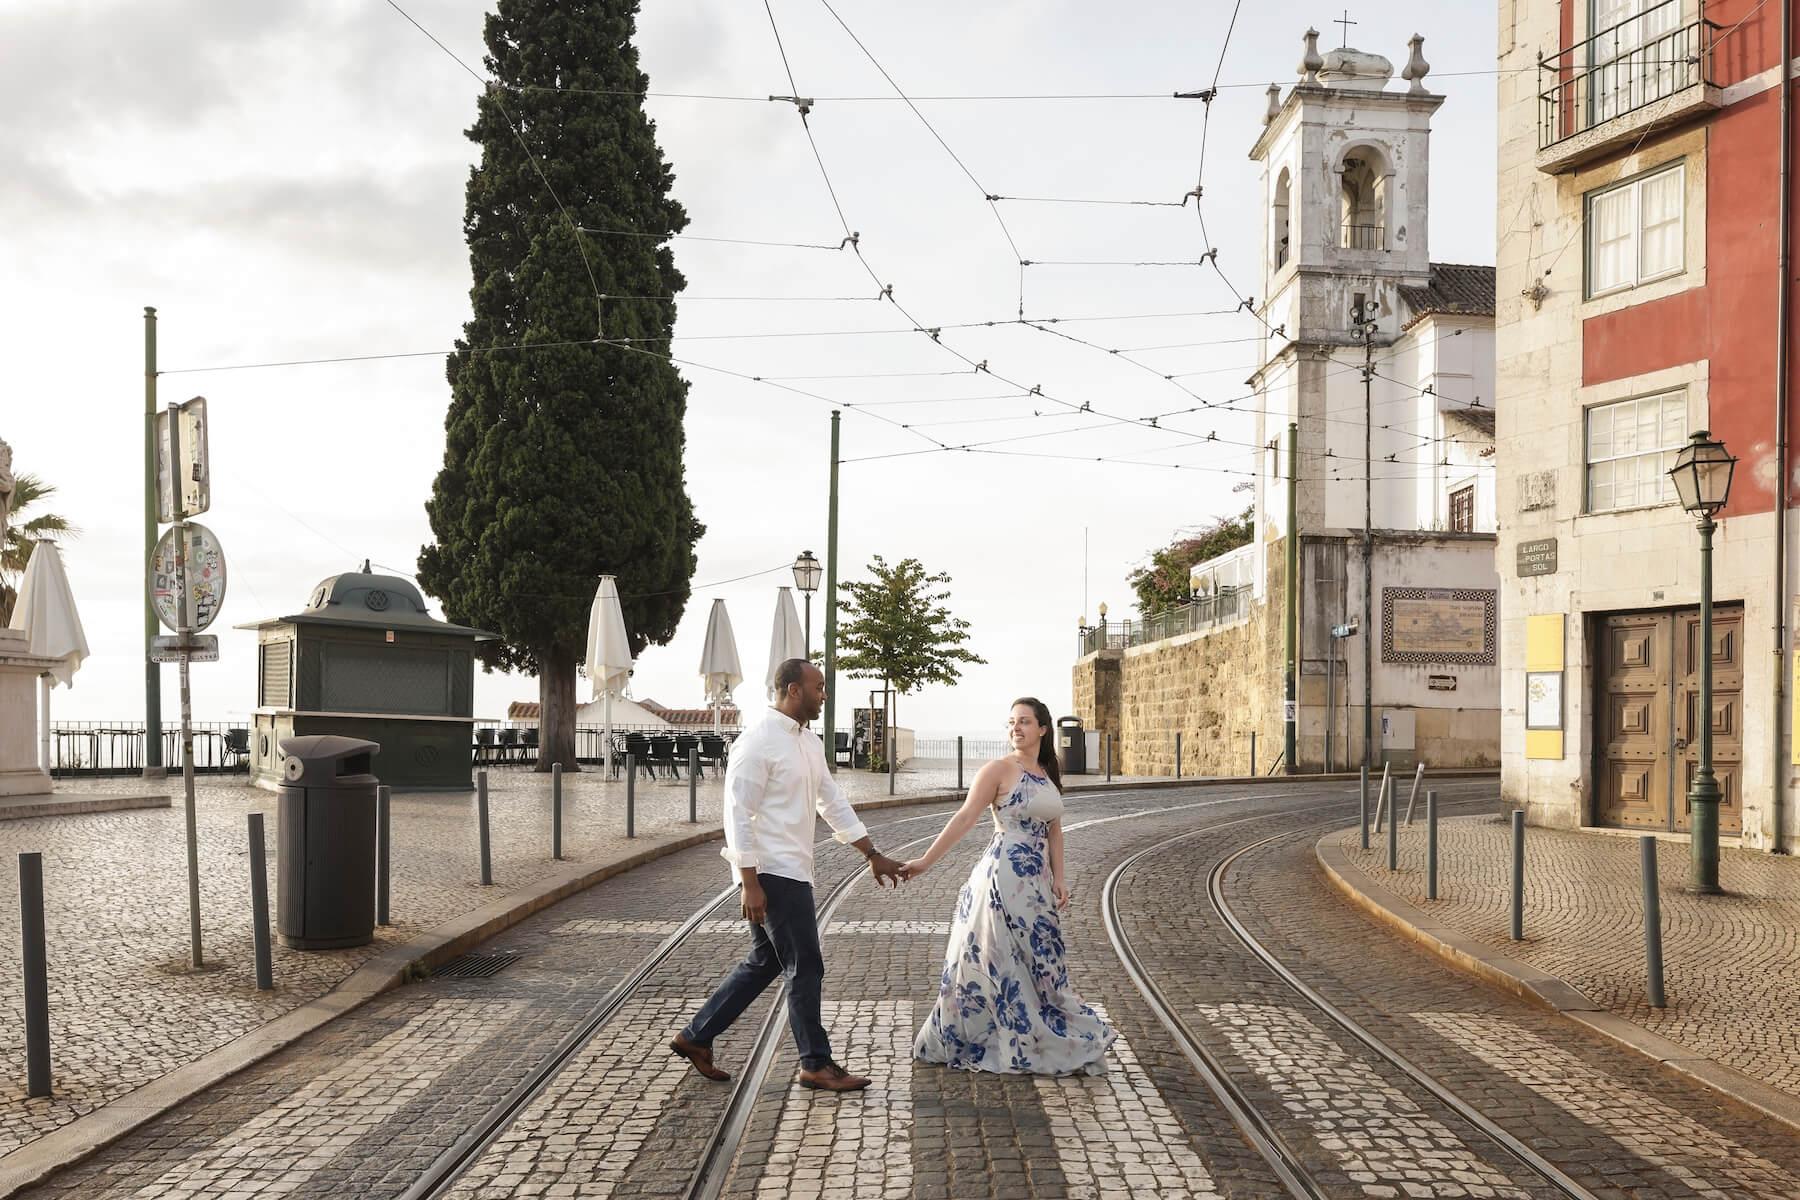 lisbon-05-24-2019-proposal-31_original